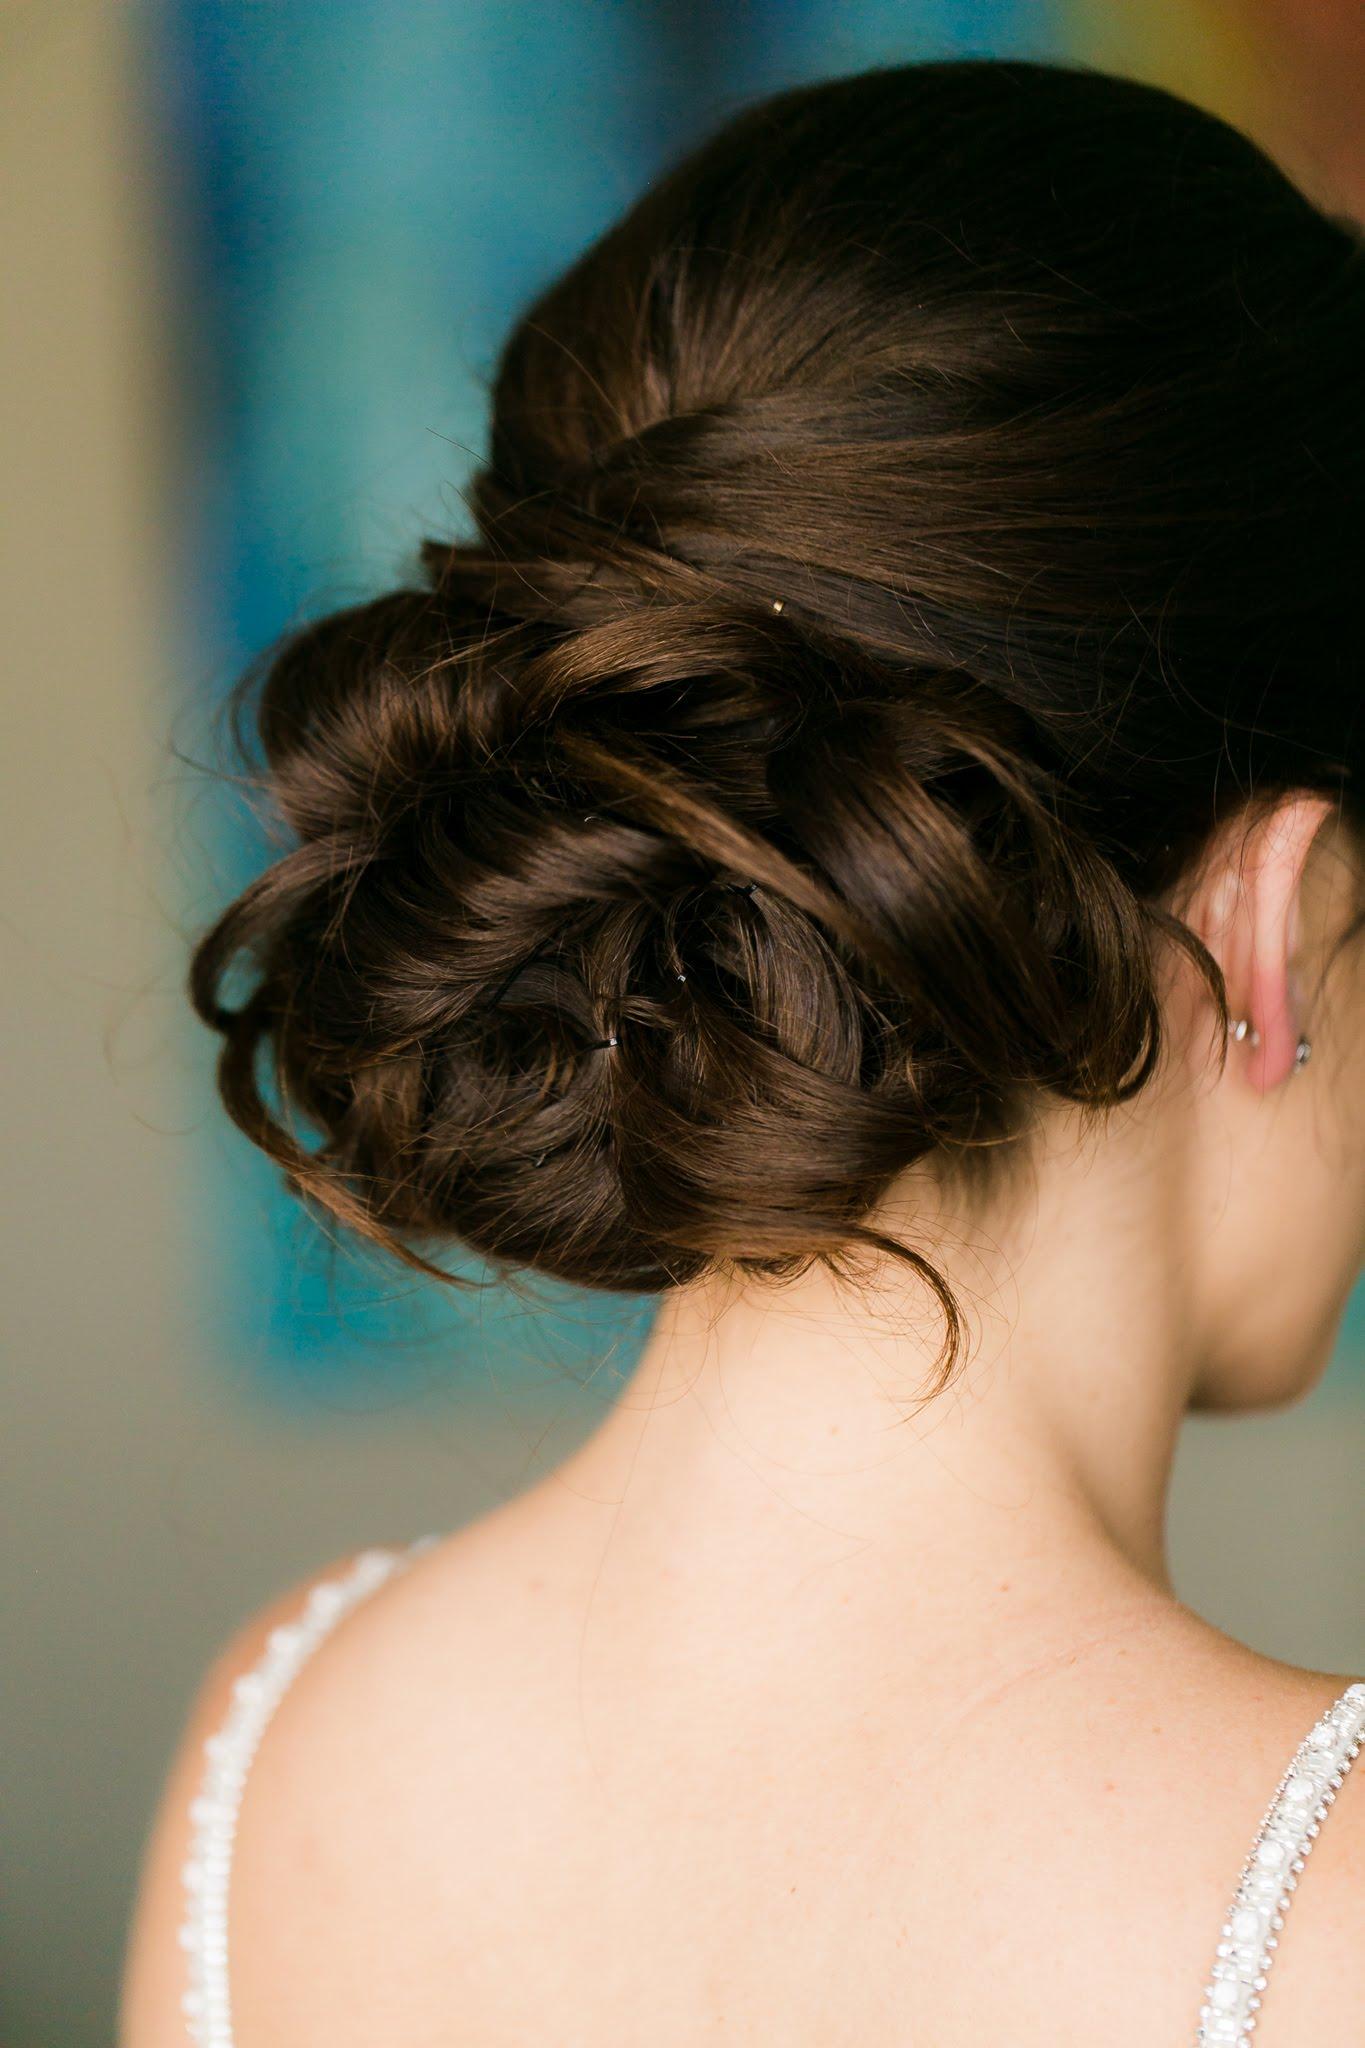 09-07-palm-springs-wedding-bridal-hair-and-makeup